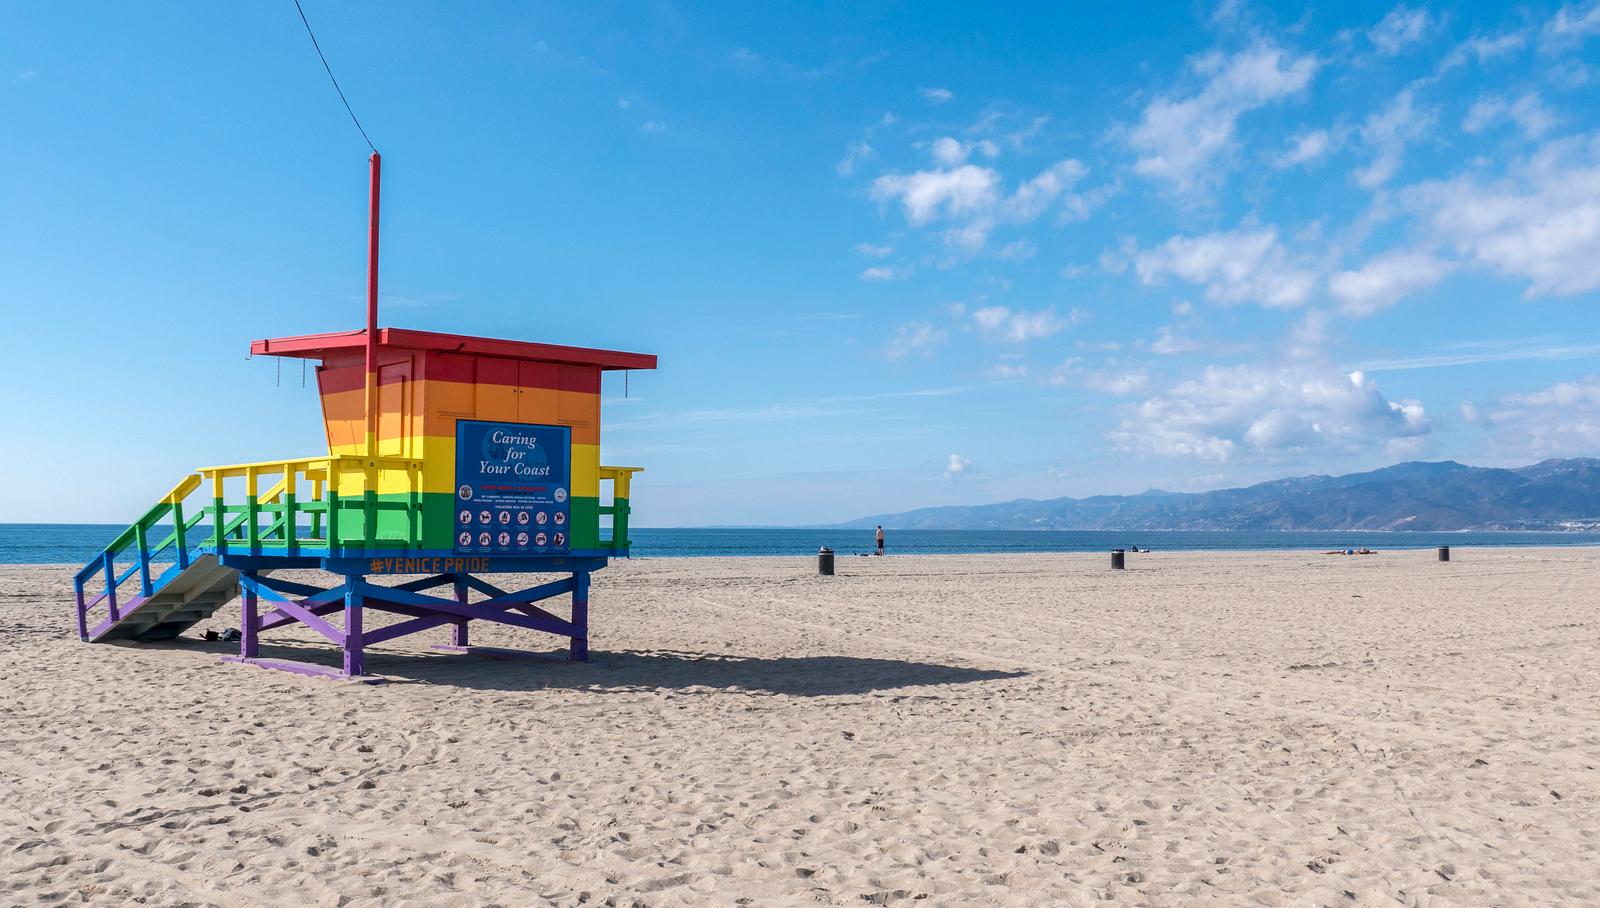 Venice Pride Lifeguard Stand